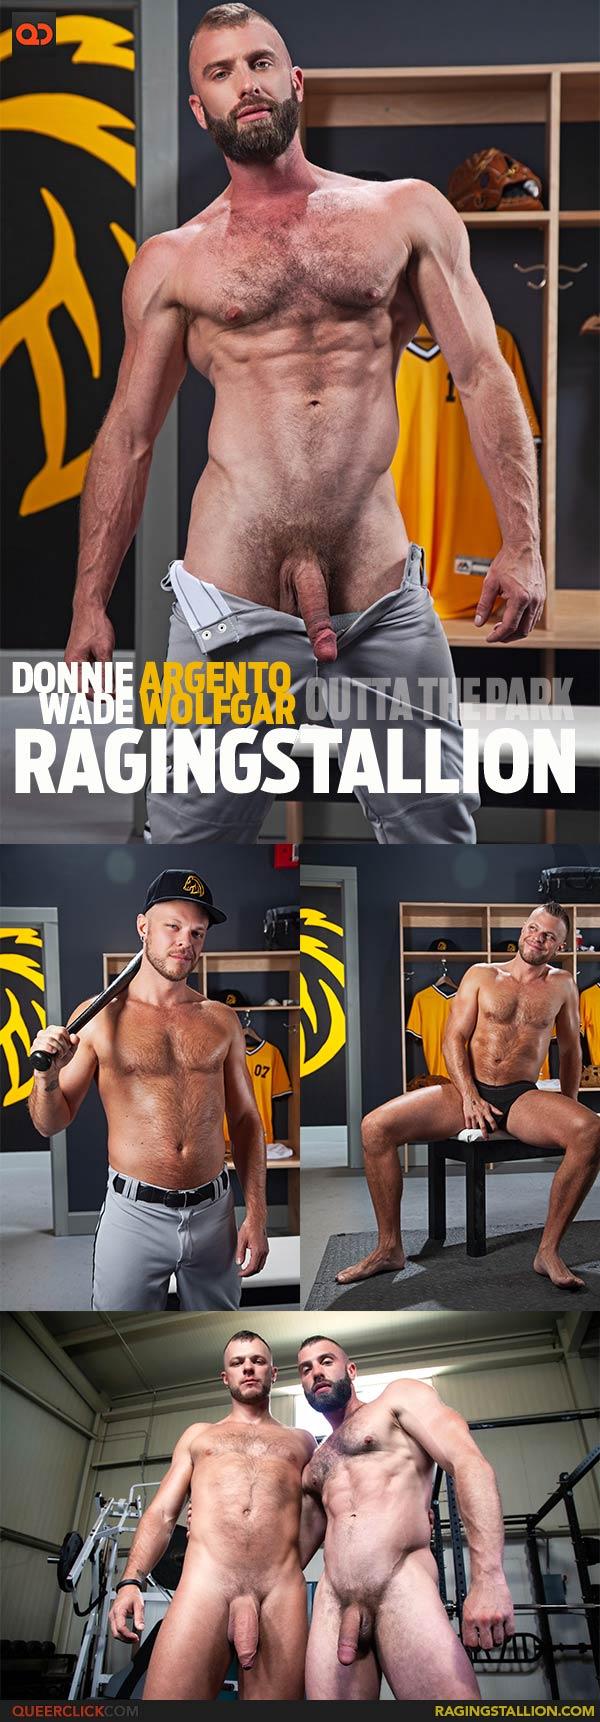 Raging Stallion:  Wade Wolfgar and Donnie Argento